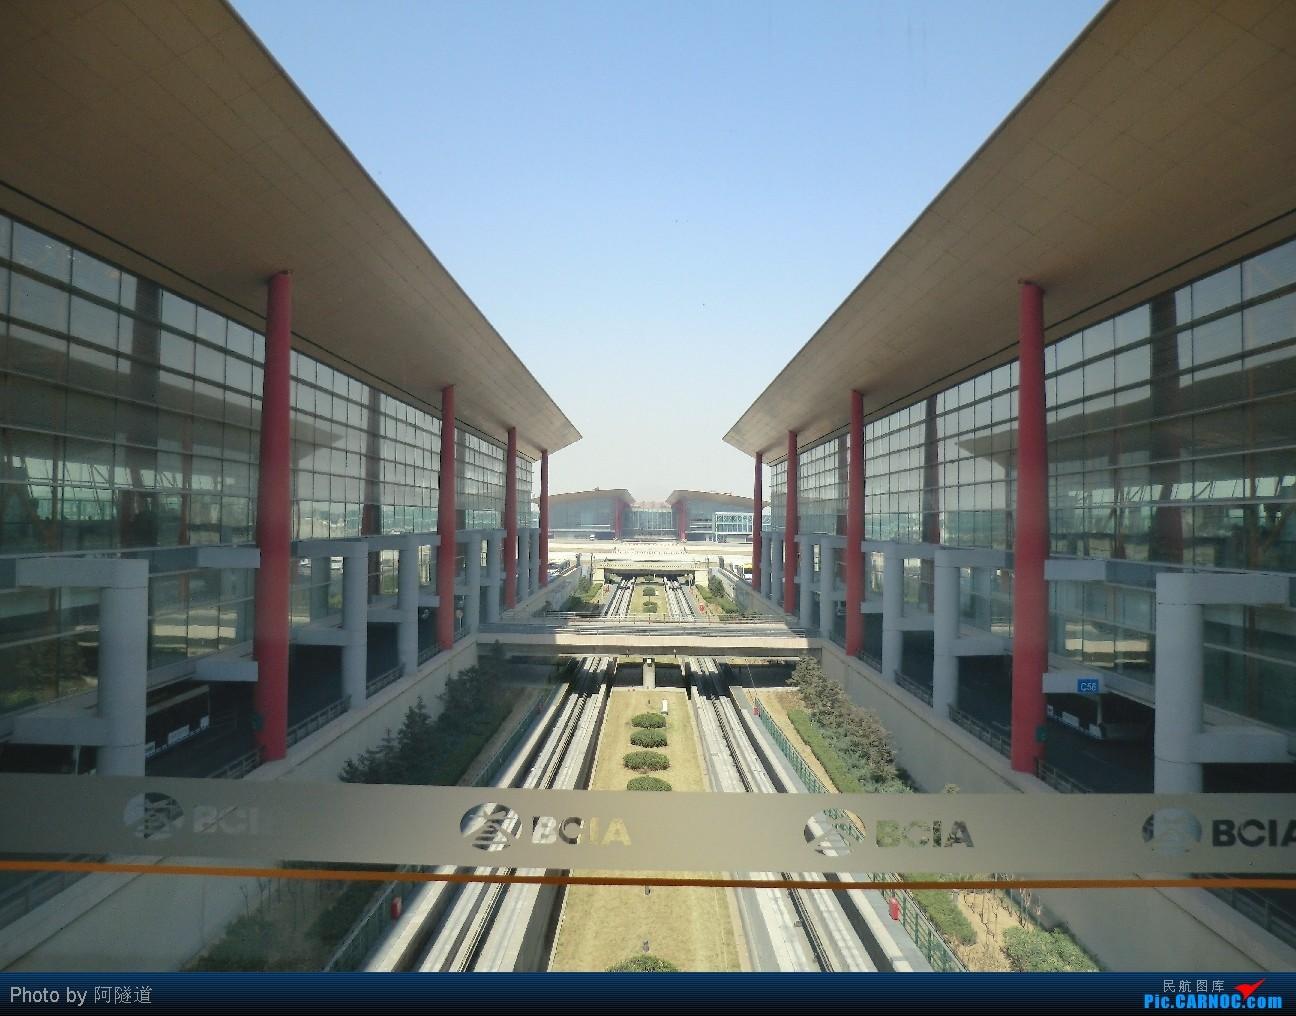 Re:[原创]偶妈的游记:pek-sha CA1517  sha-pek CA1832(上)    中国北京首都机场